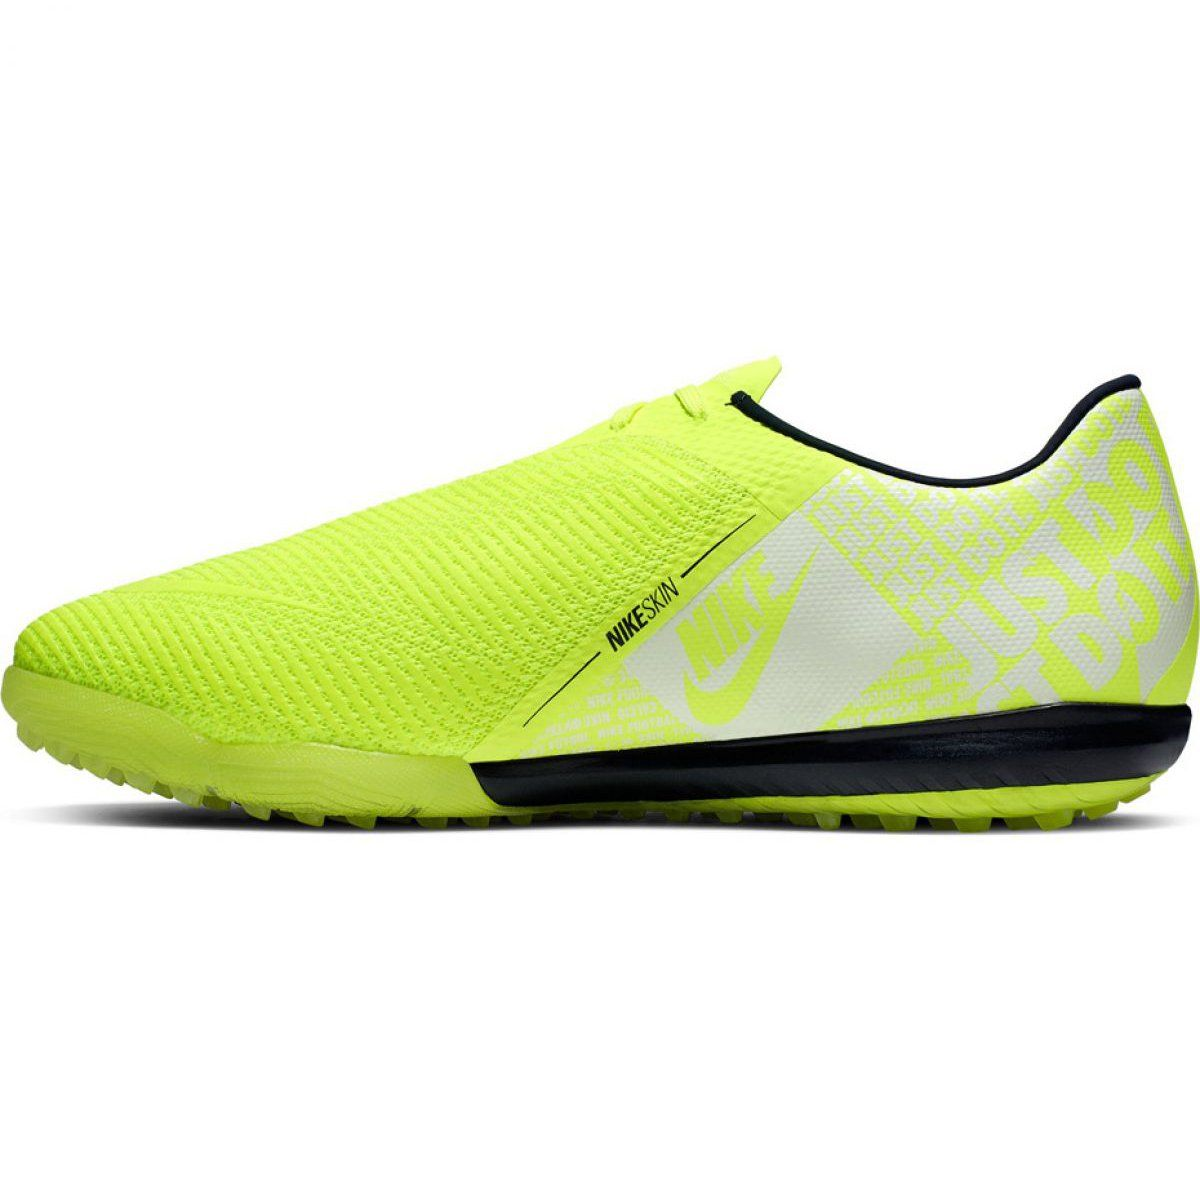 Buty Pilkarskie Nike Zoom Phantom Venom Pro Tf M Bq7497 717 Zolte Zolte Nike Zoom Nike Soccer Shoes Football Shoes